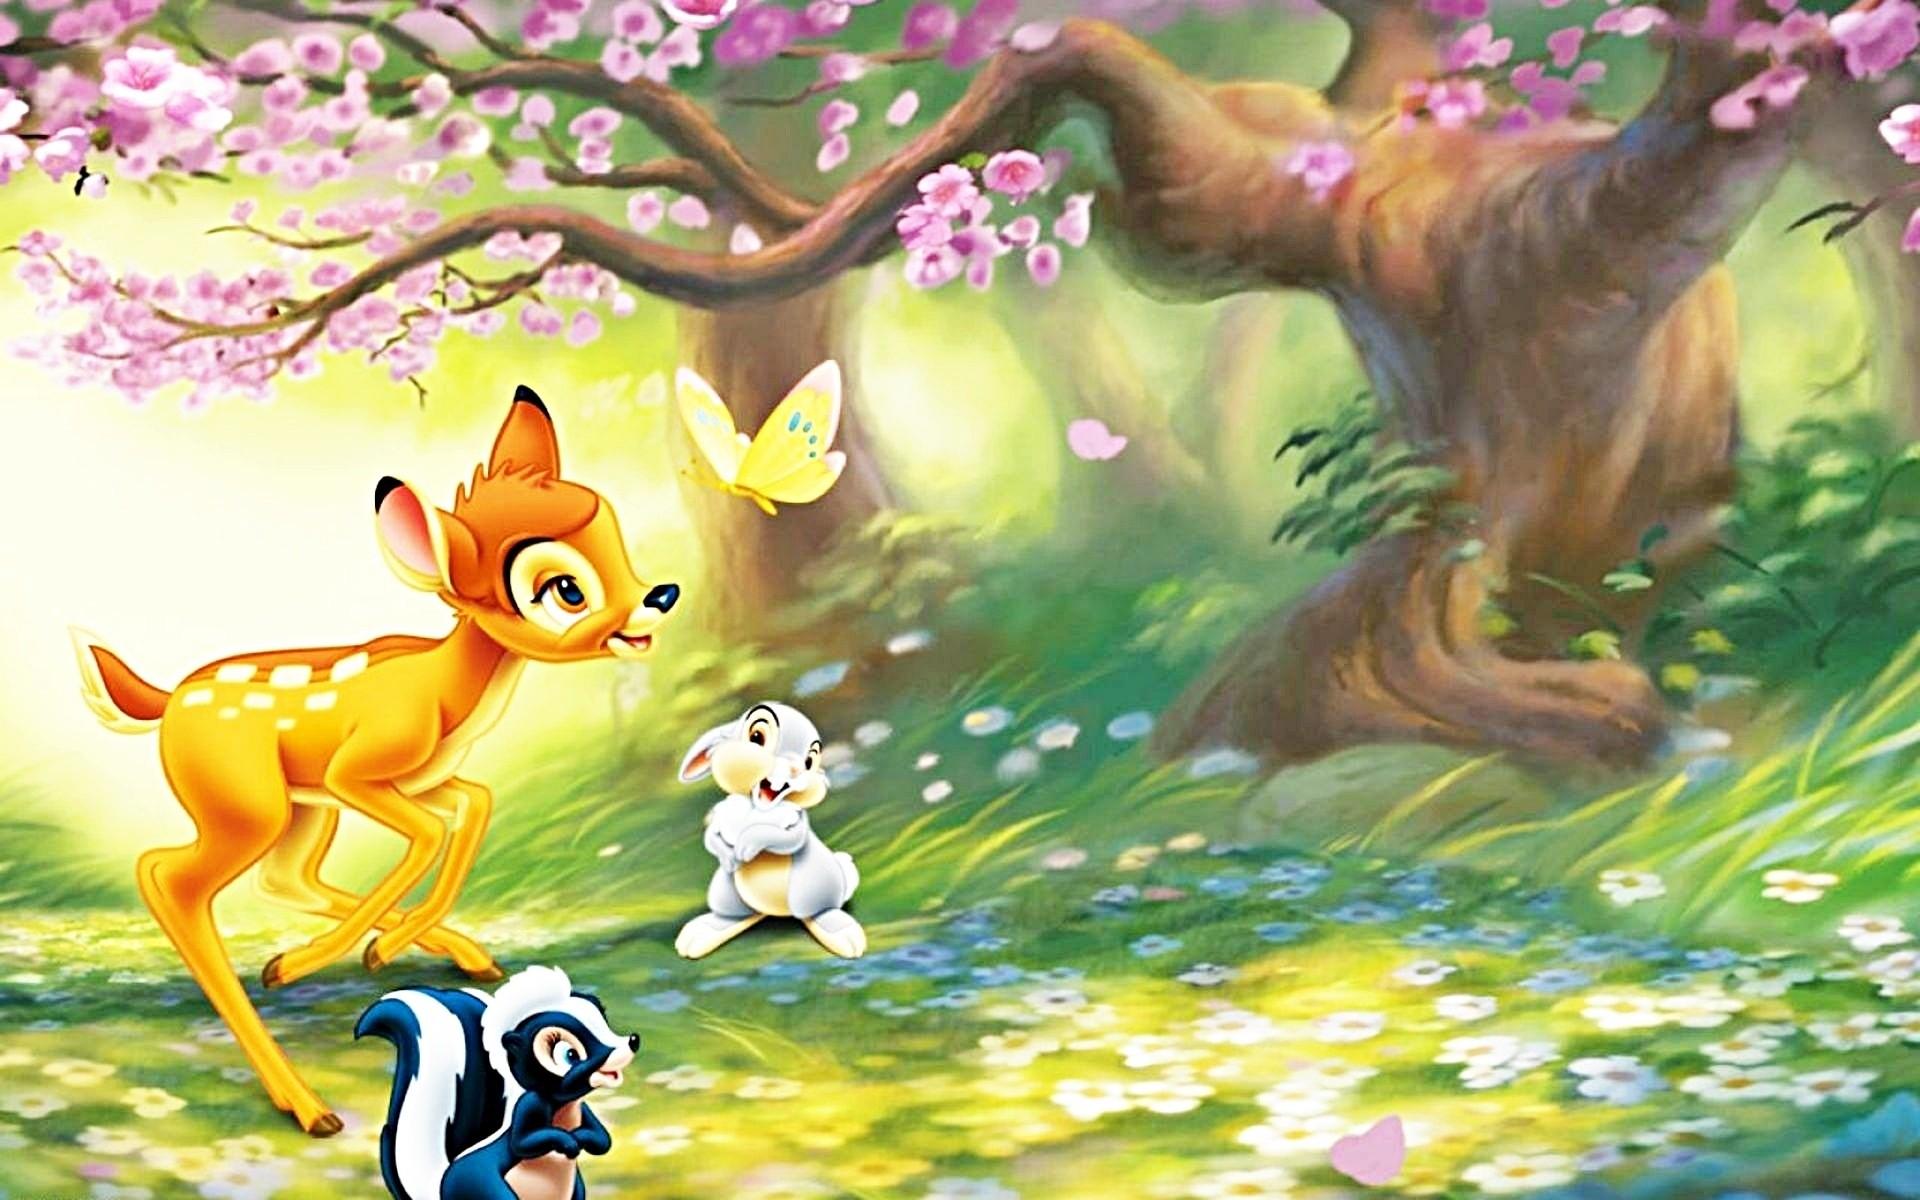 Res: 1920x1200, walt disney bambi cartoon dibujos animados wallpaper